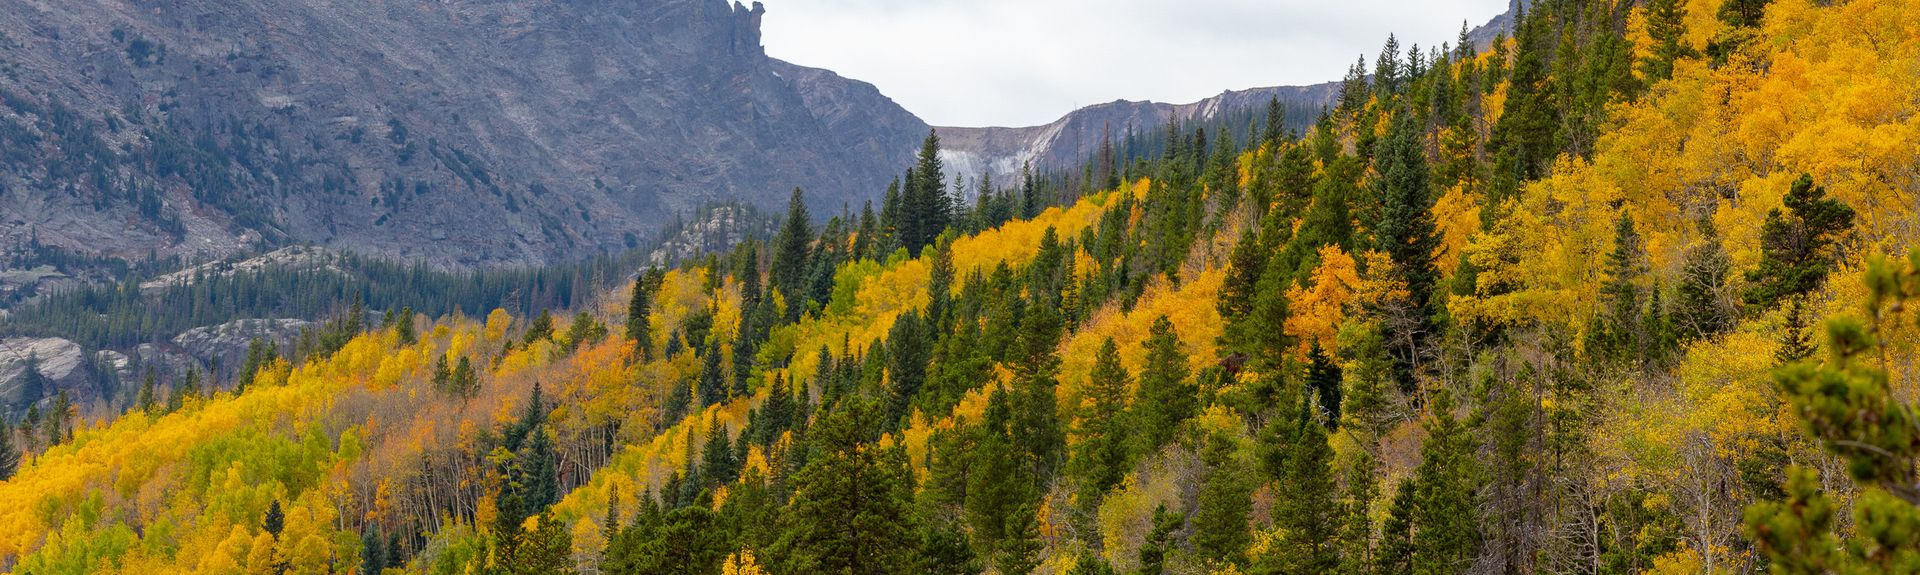 Glen Haven, Colorado, Verenigde Staten